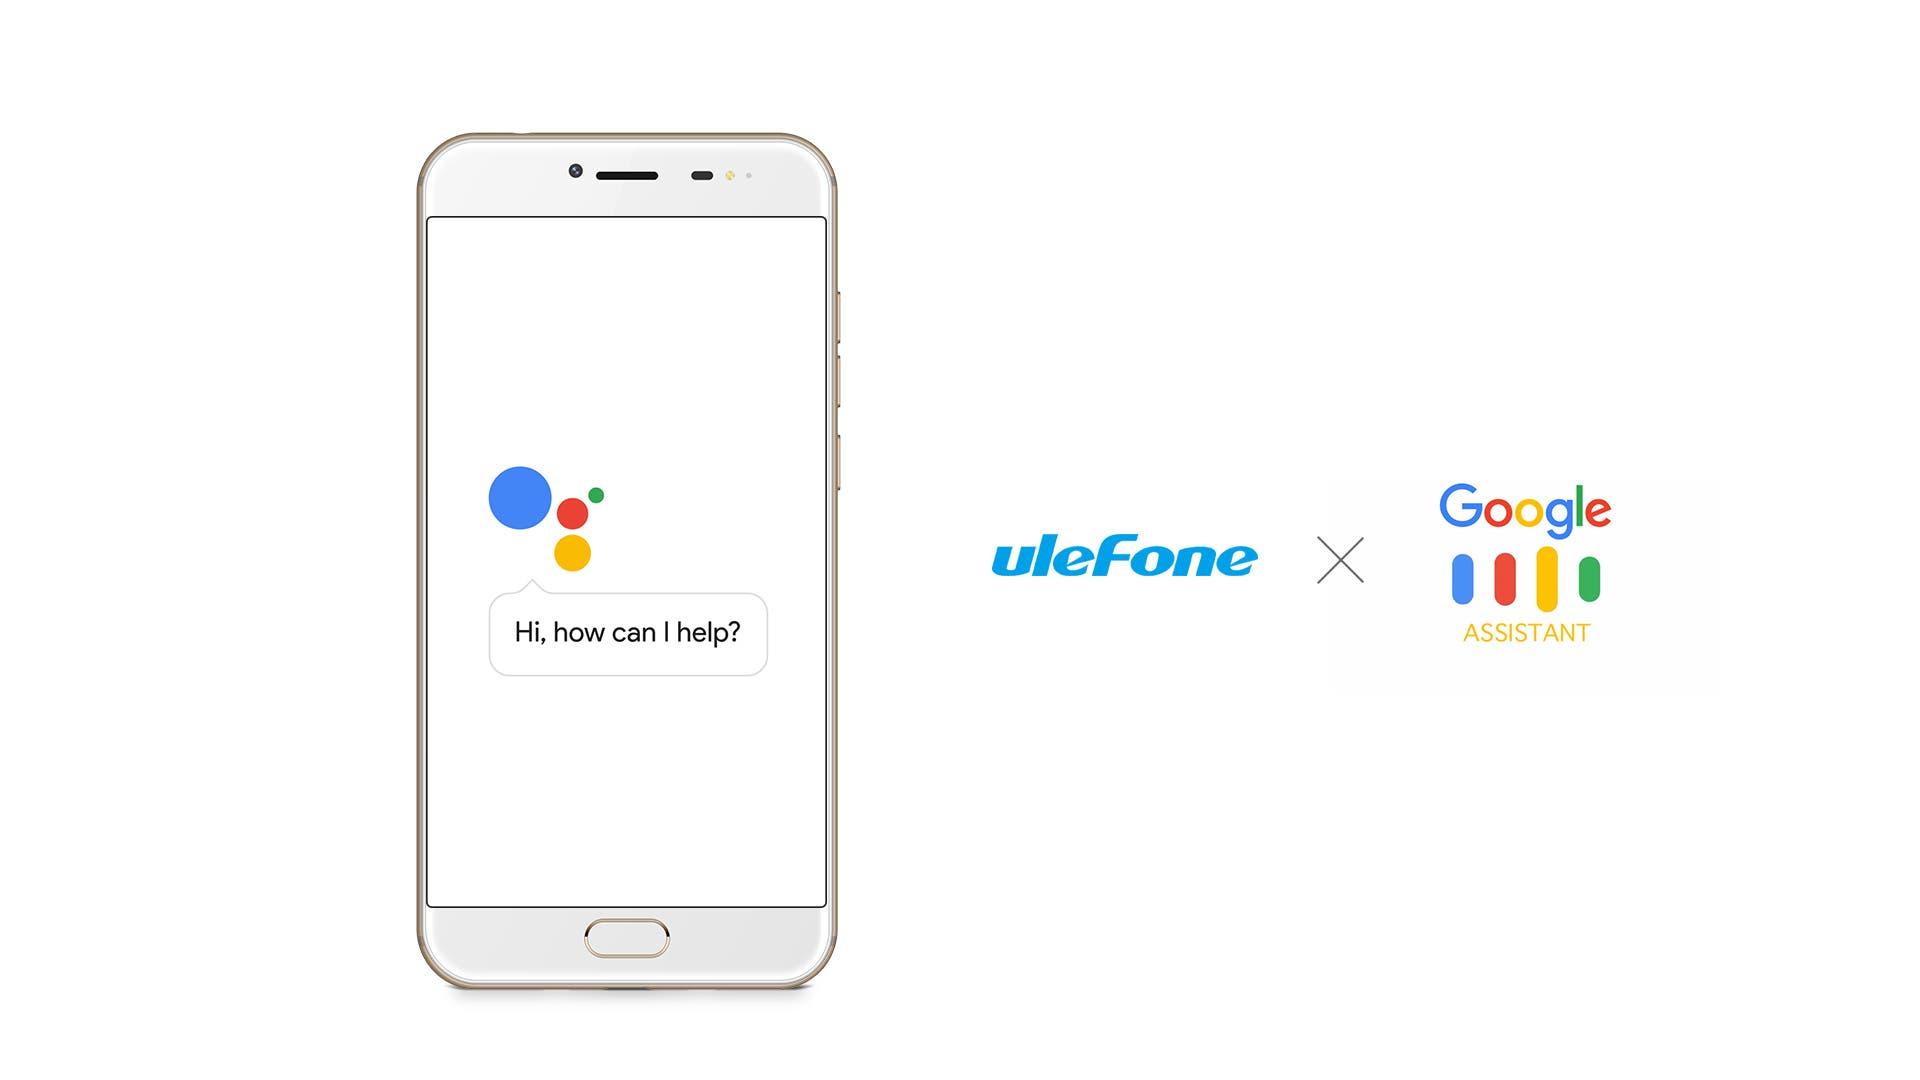 Ulefone Google Assistant